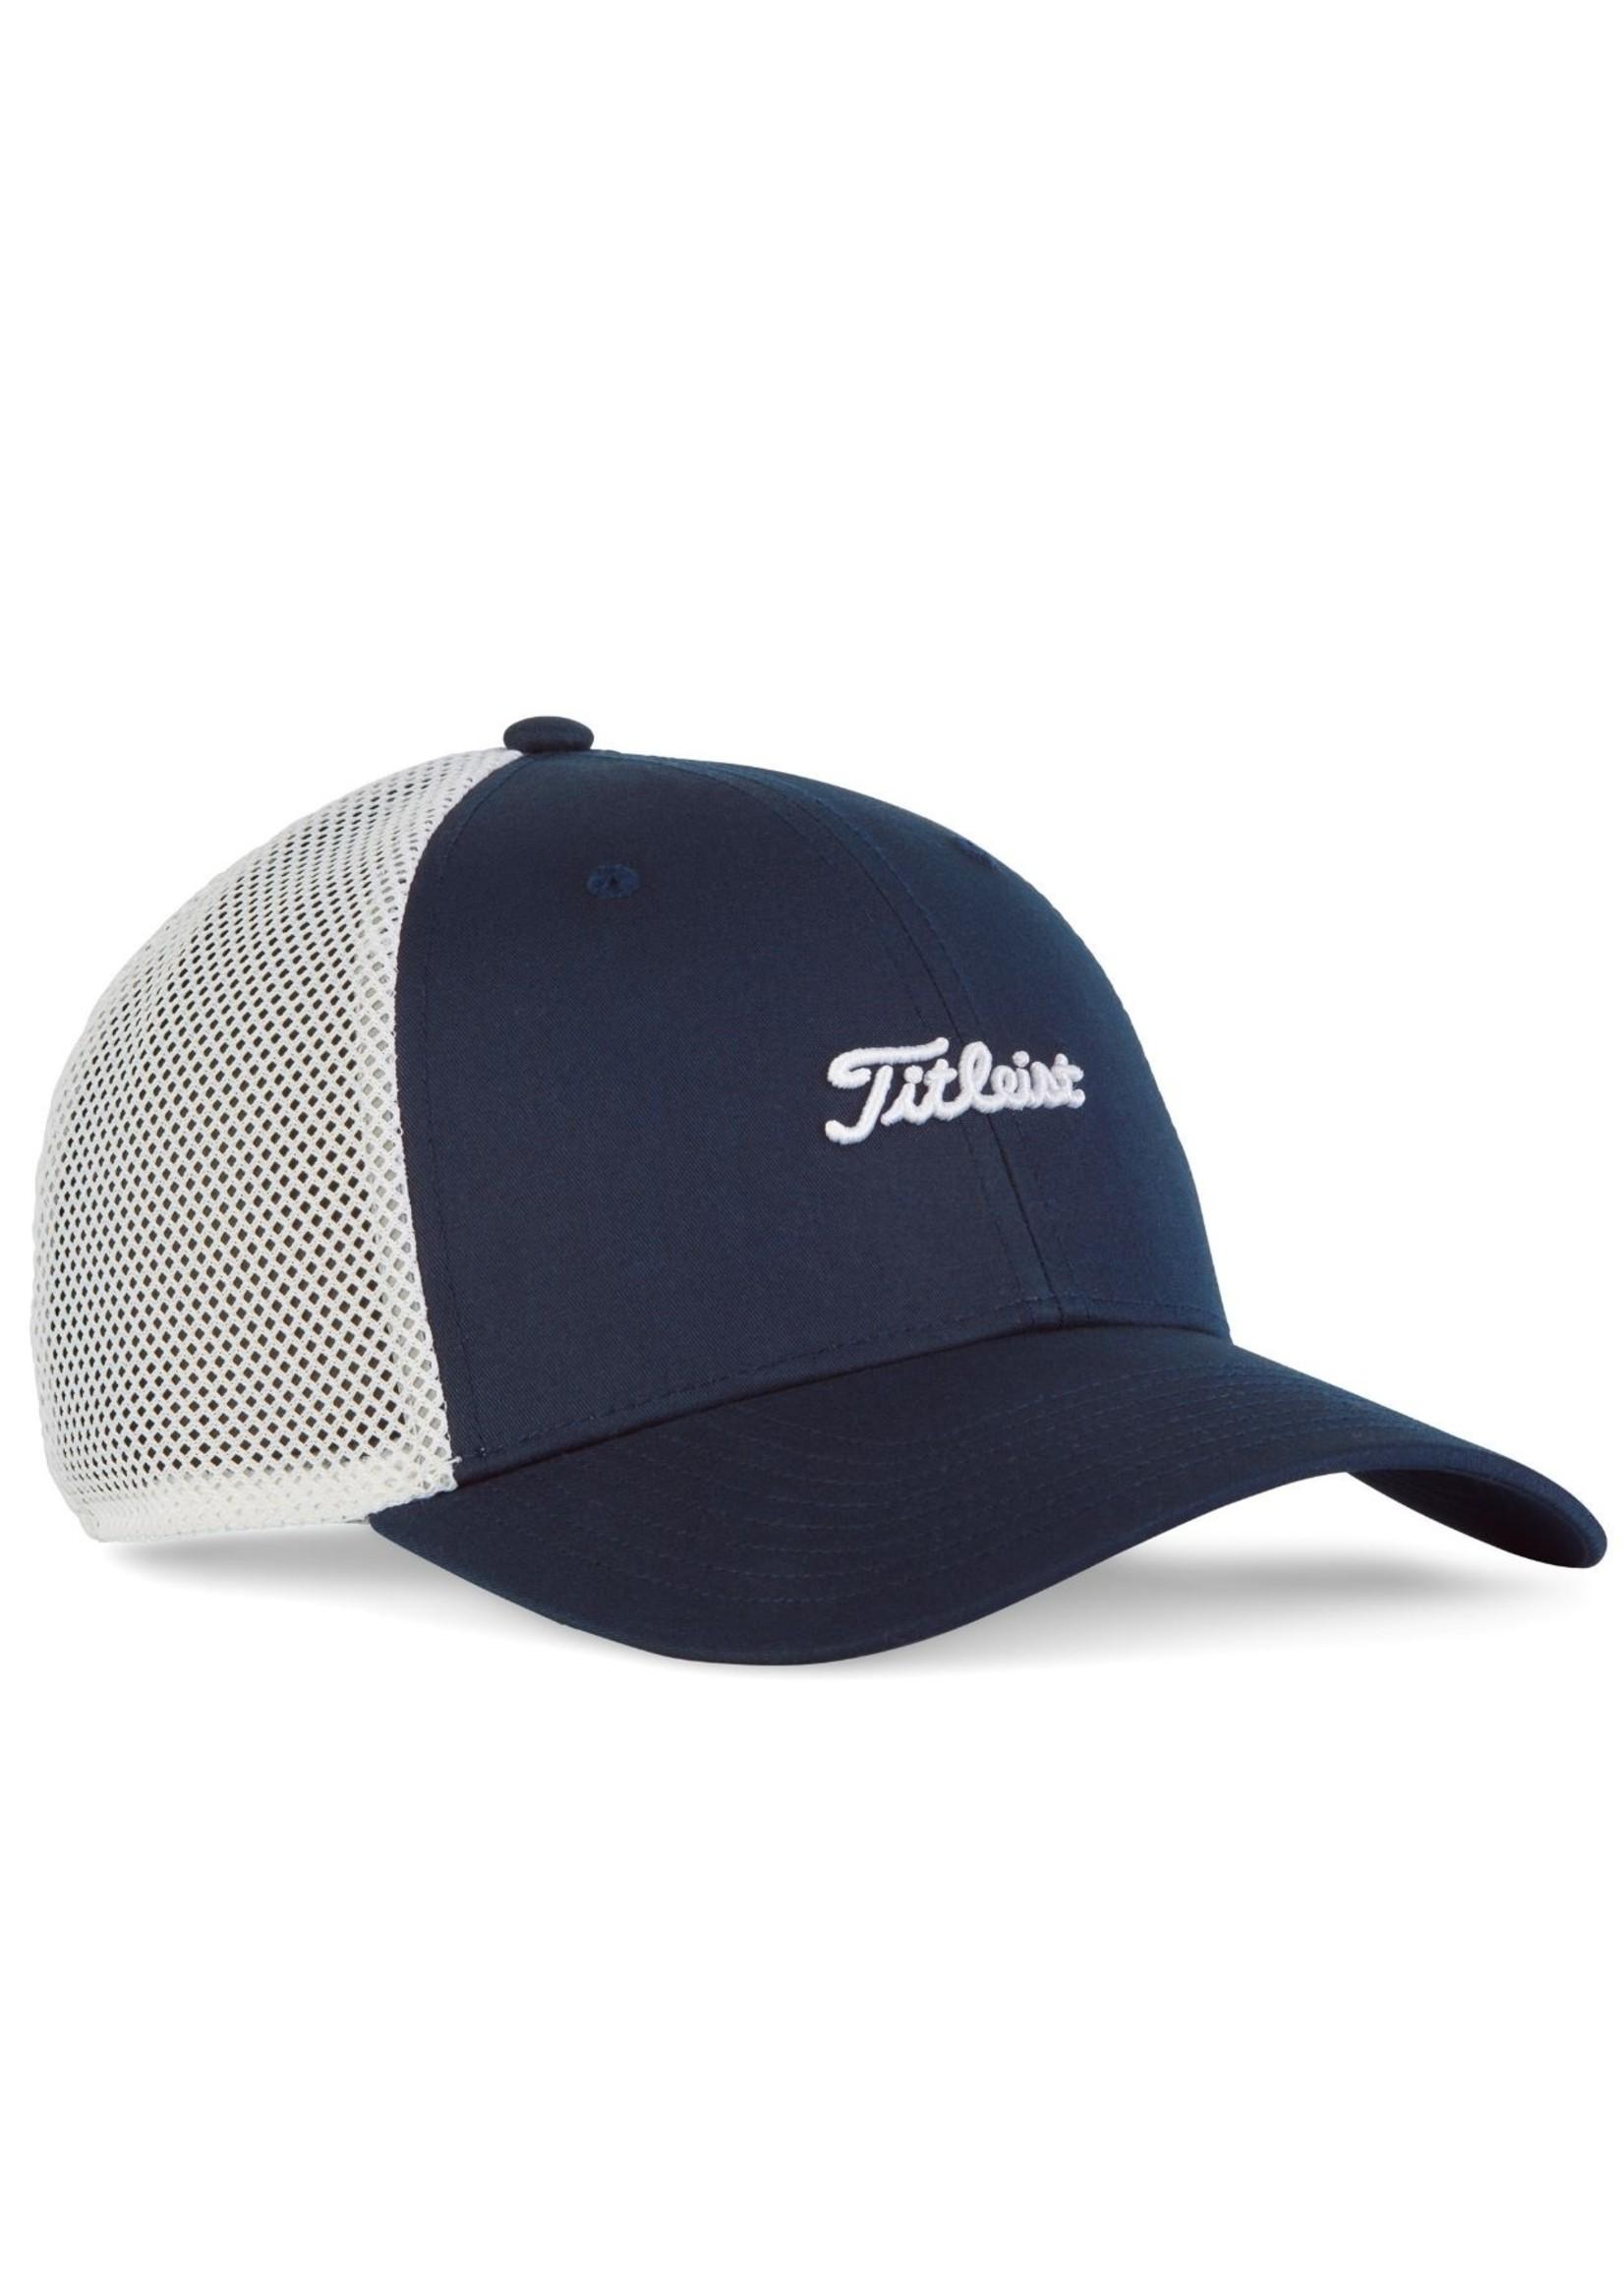 Titleist Hat Nantucket